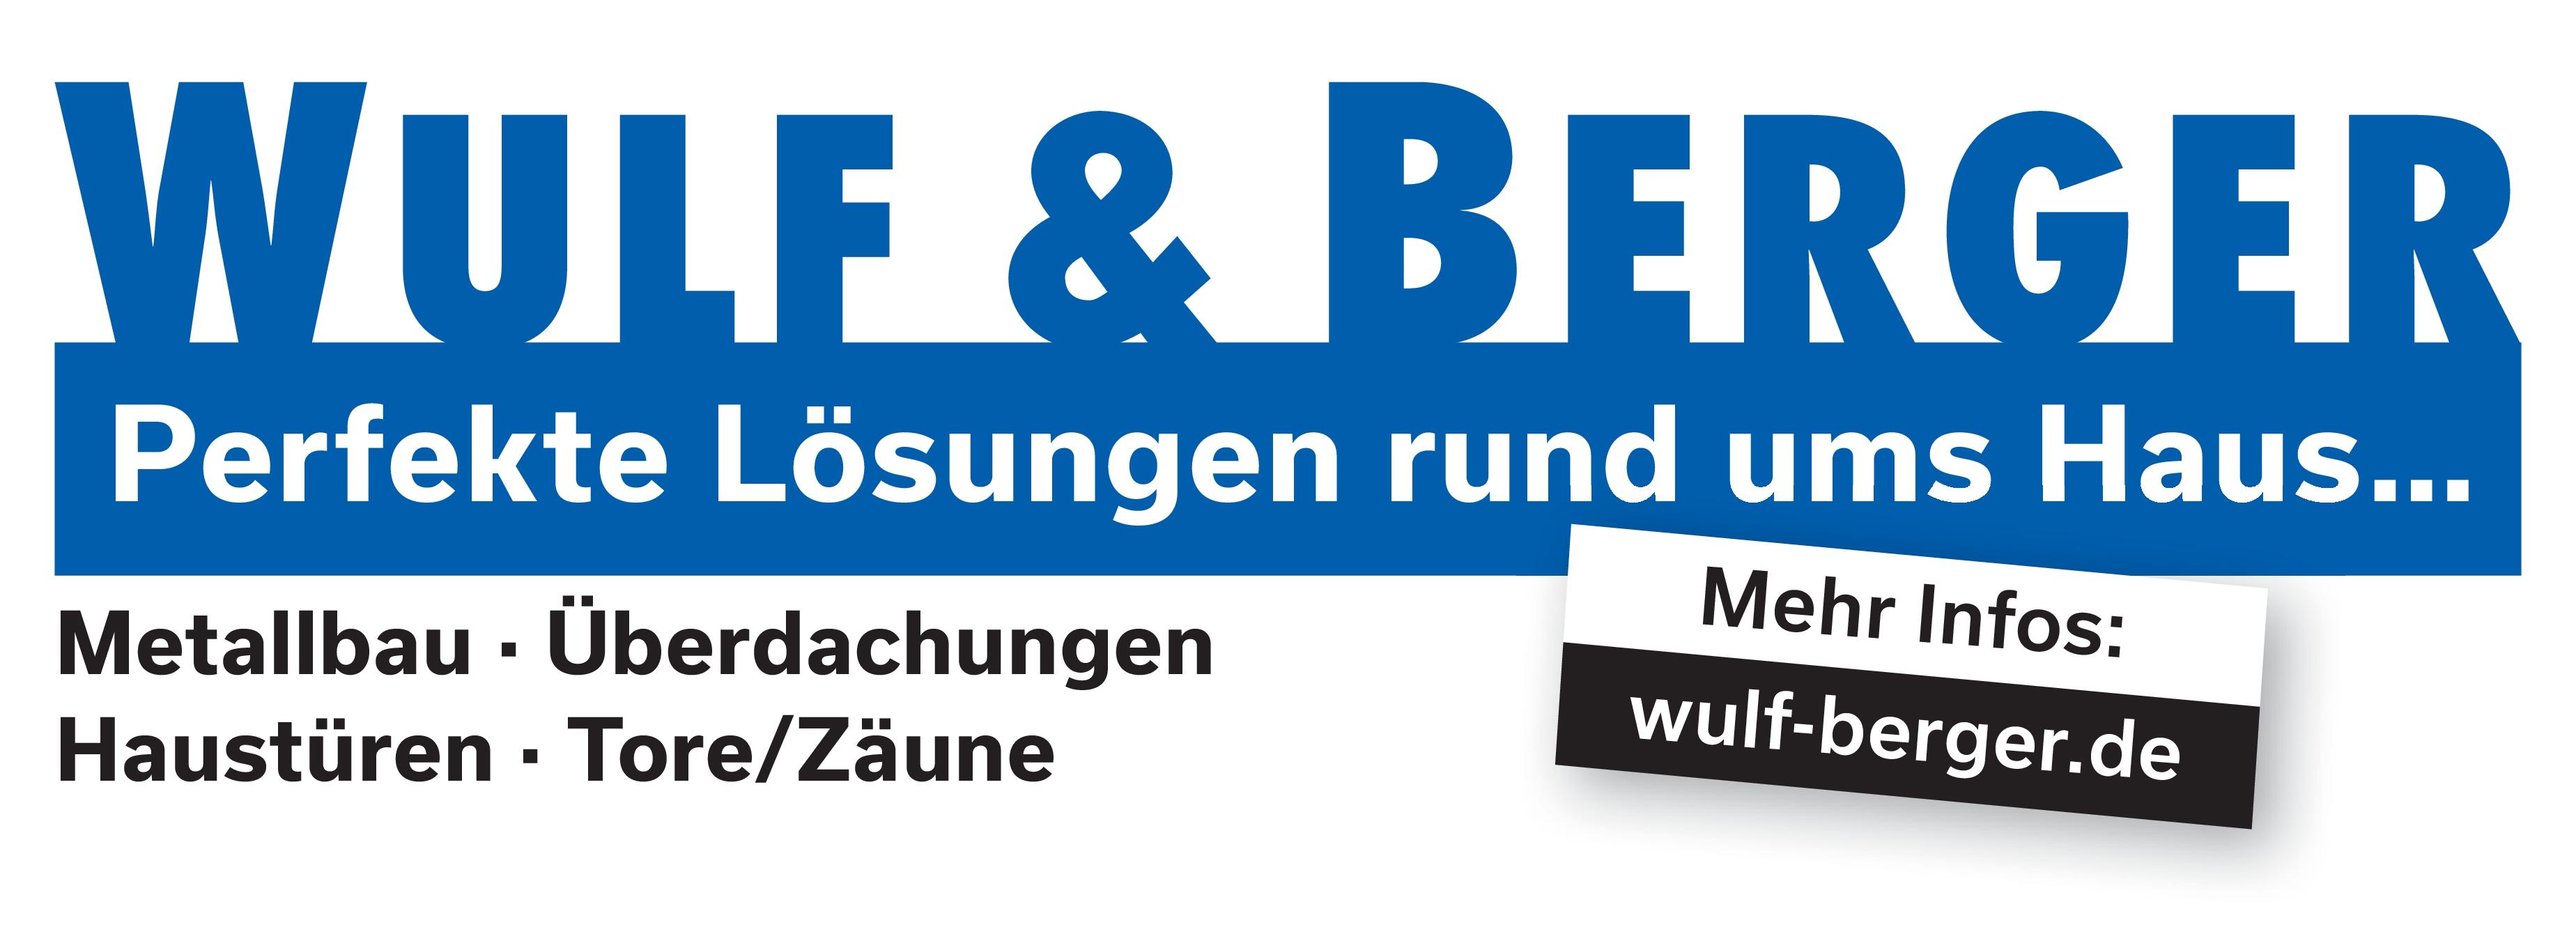 Wulf & Berger